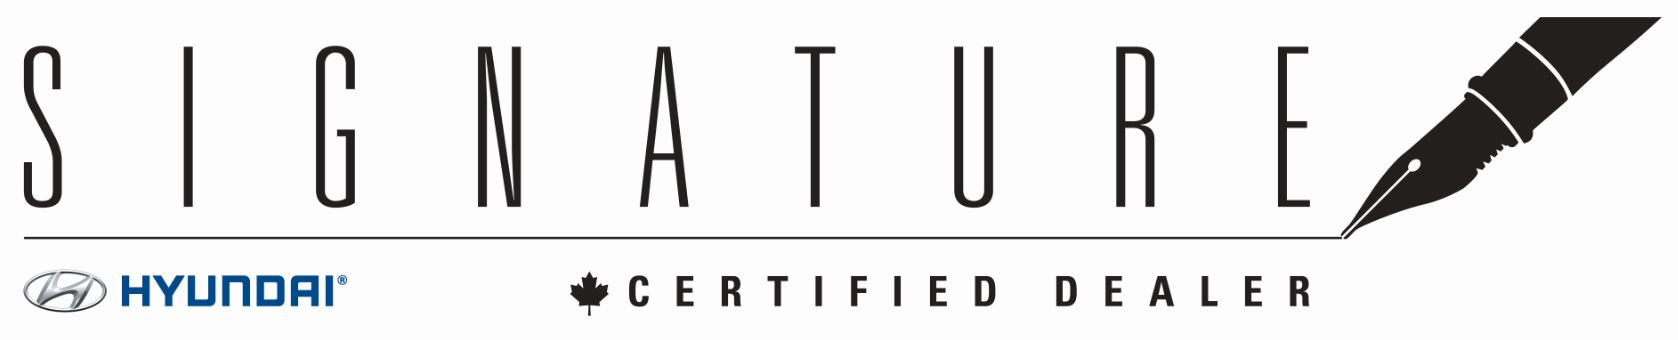 HyundaiSignatureCertified_1447179954